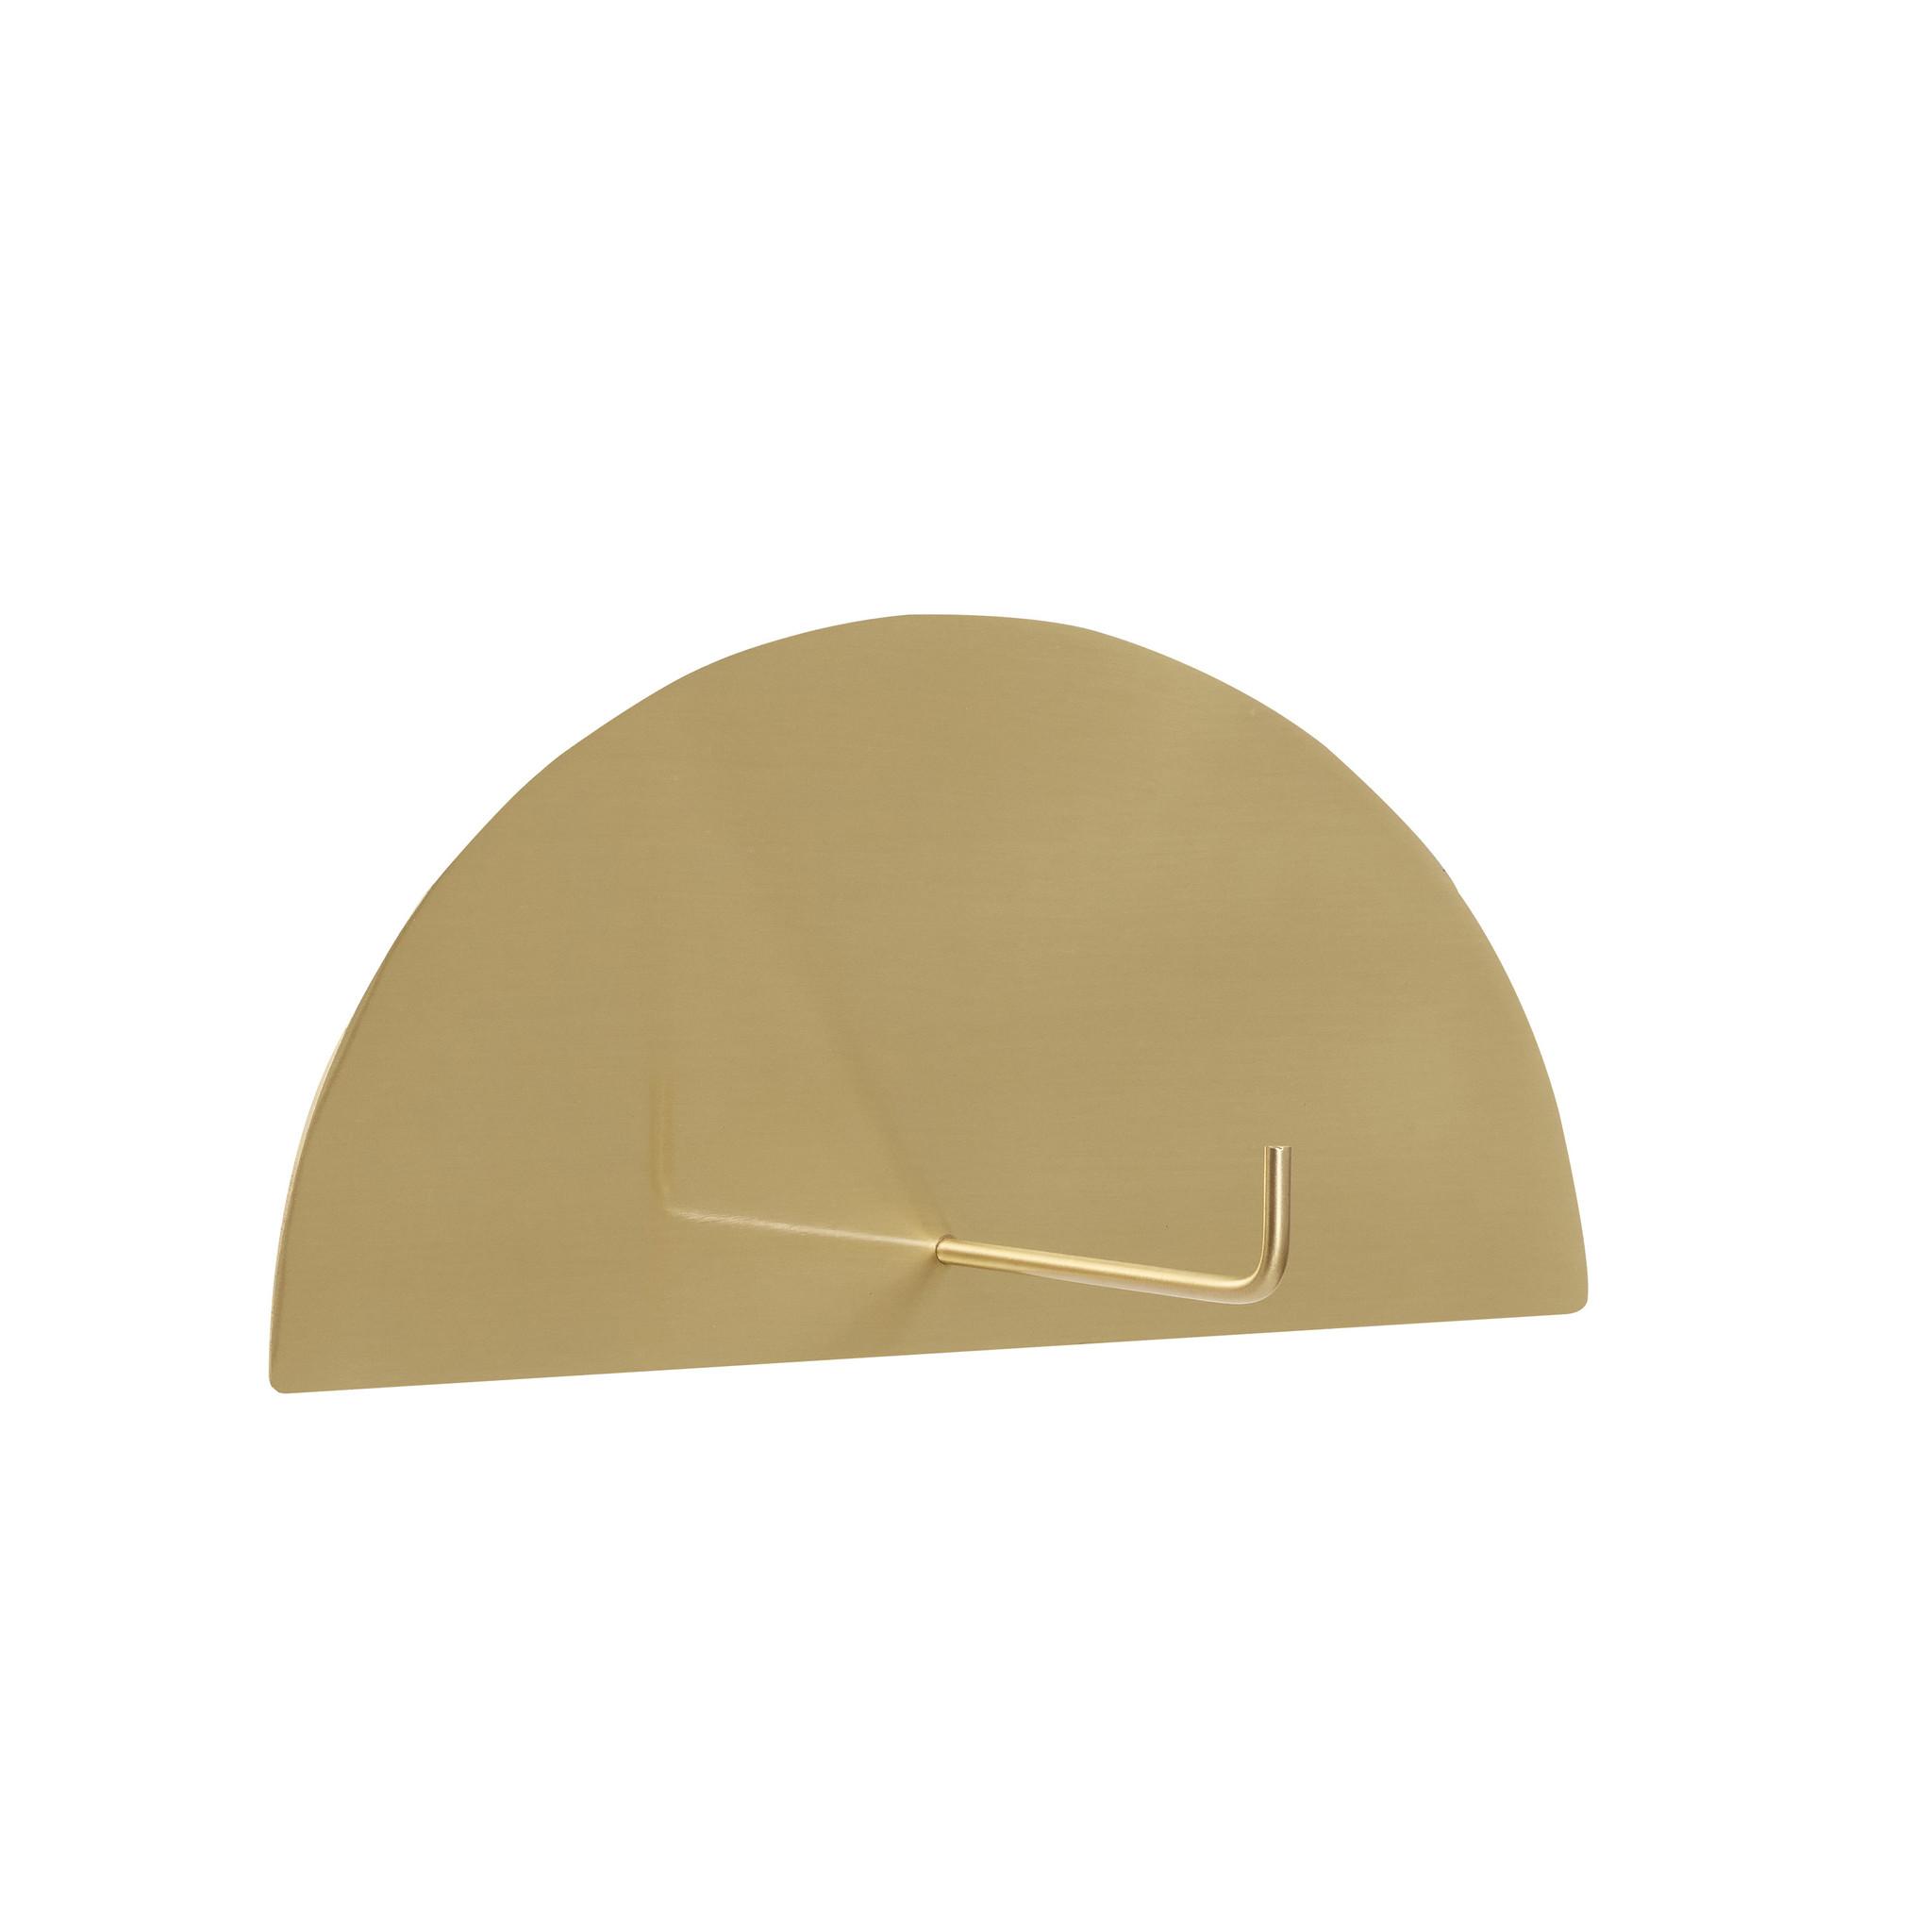 Hubsch Toiletrolhouder goud messing-991121-5712772072691